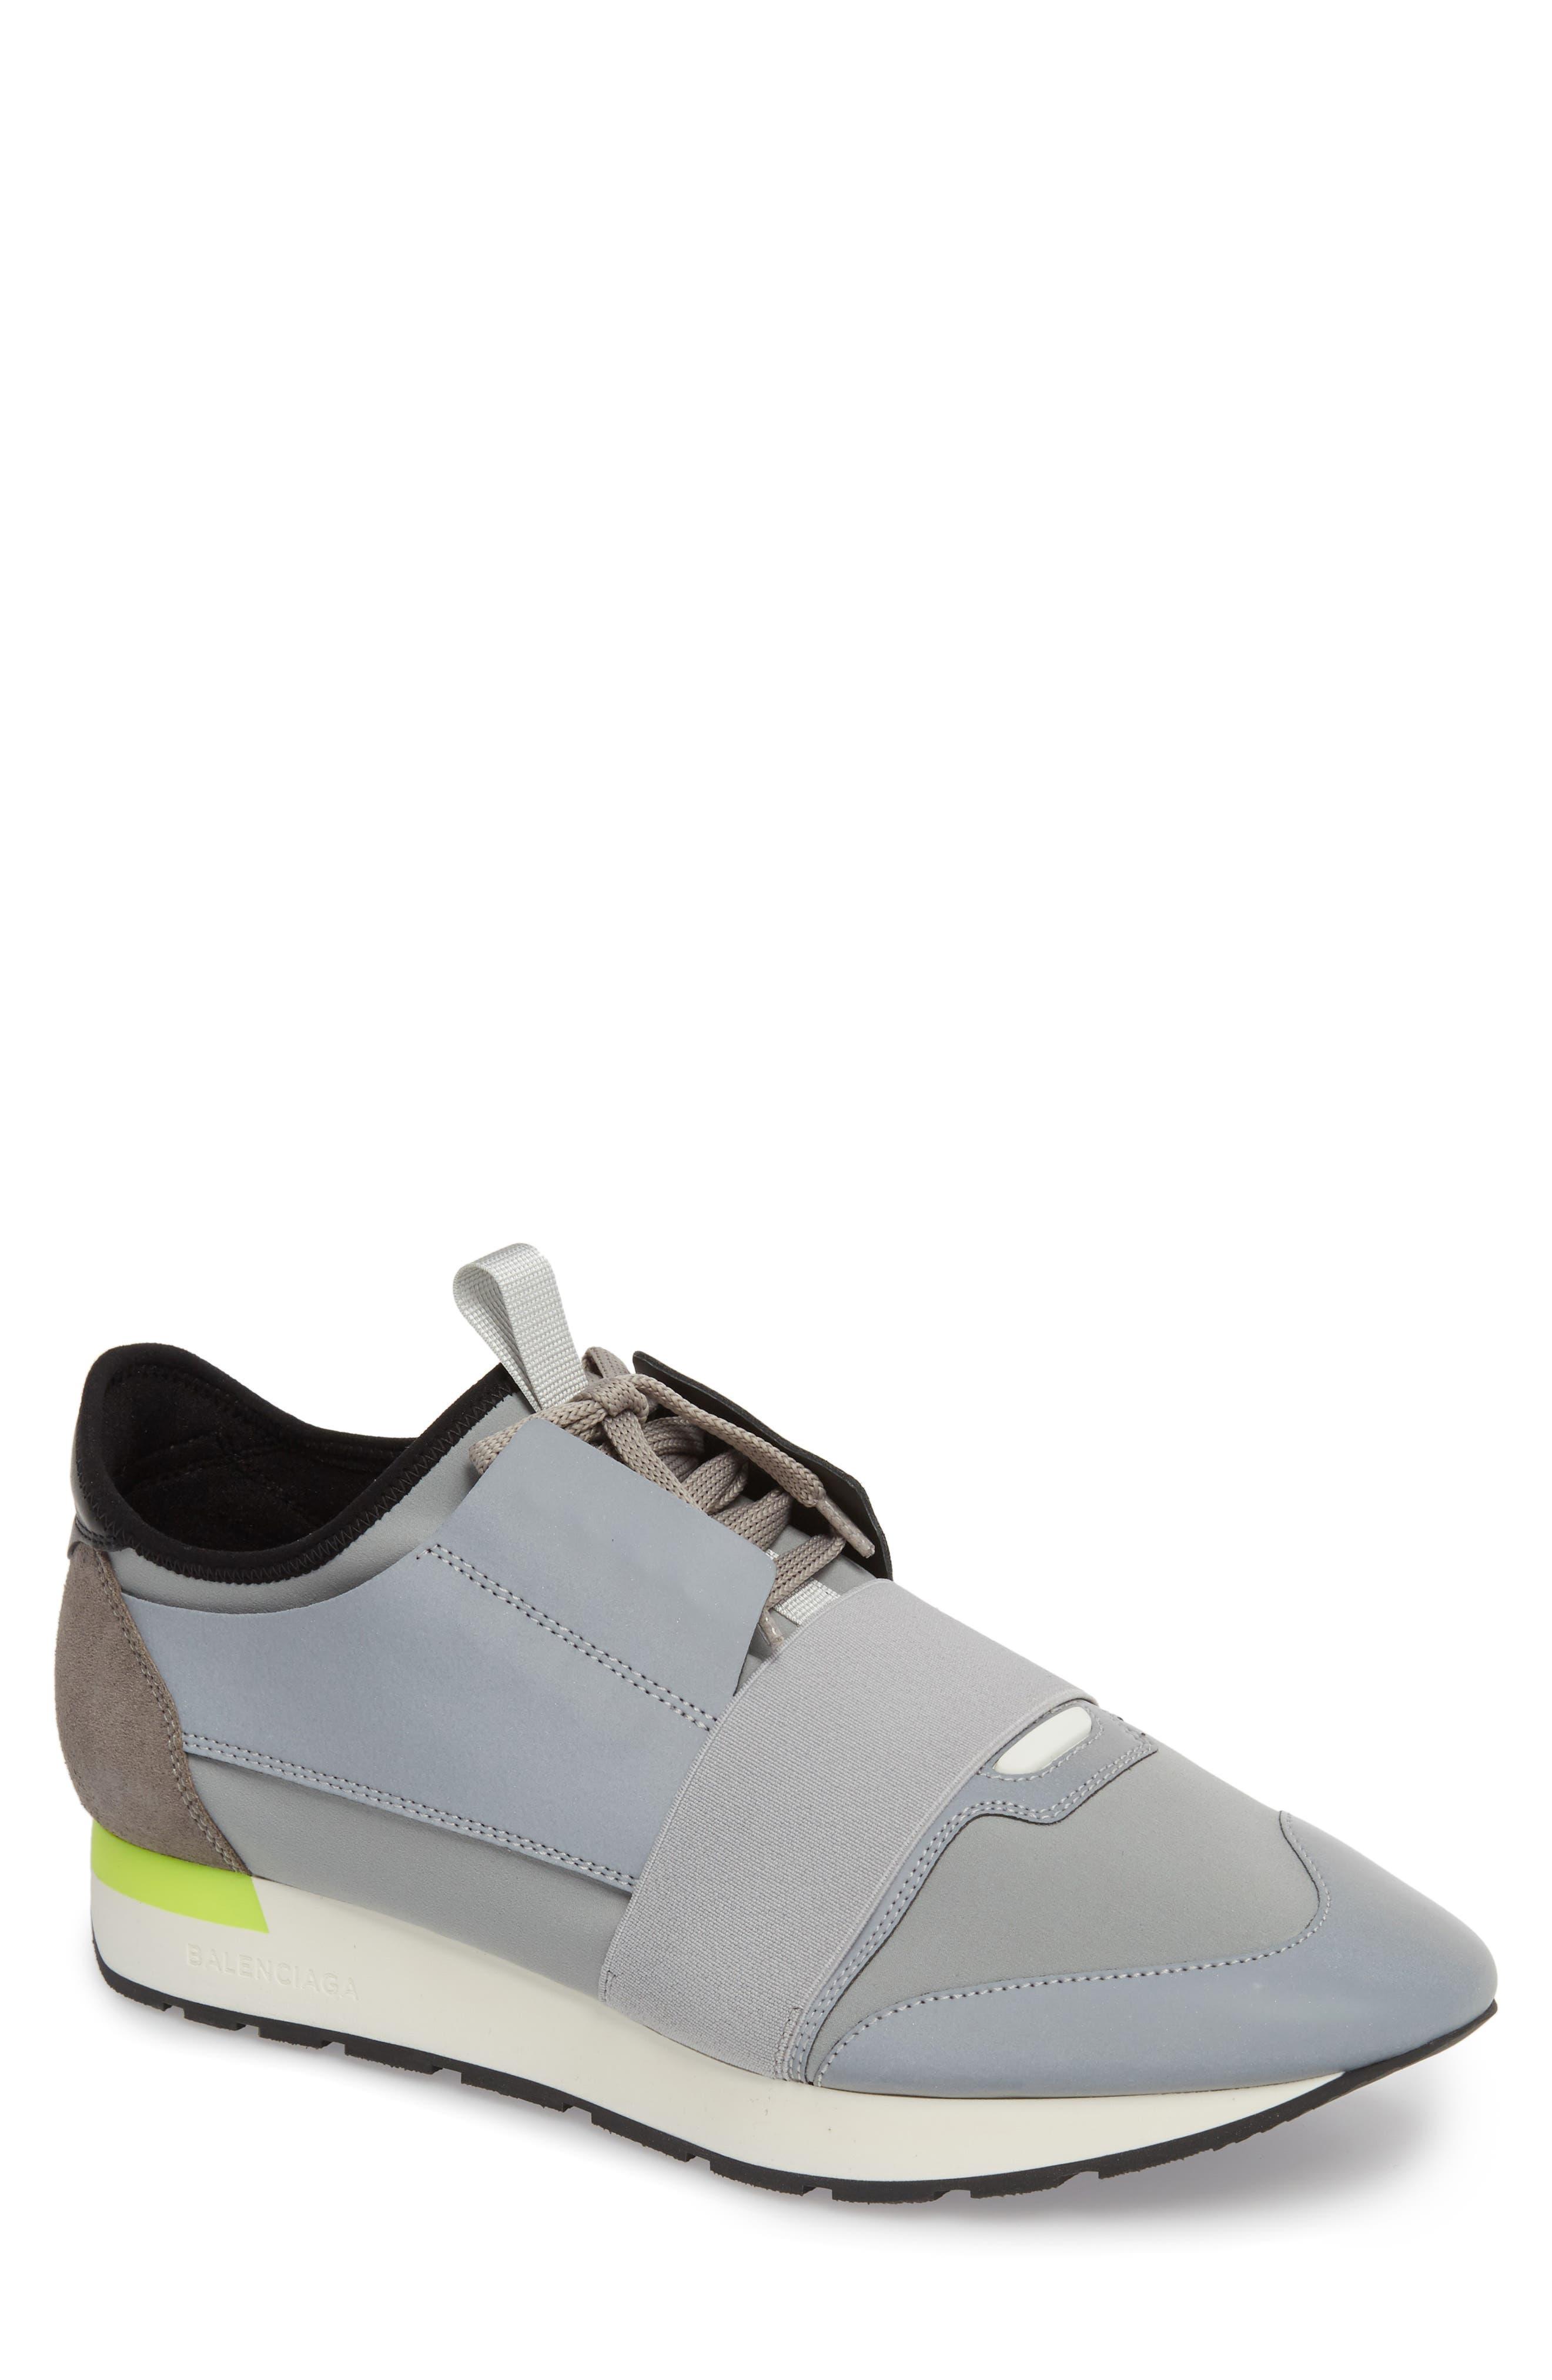 Shoes Men's Nordstrom Shoes Balenciaga Balenciaga Nordstrom Men's 1dwdRq6